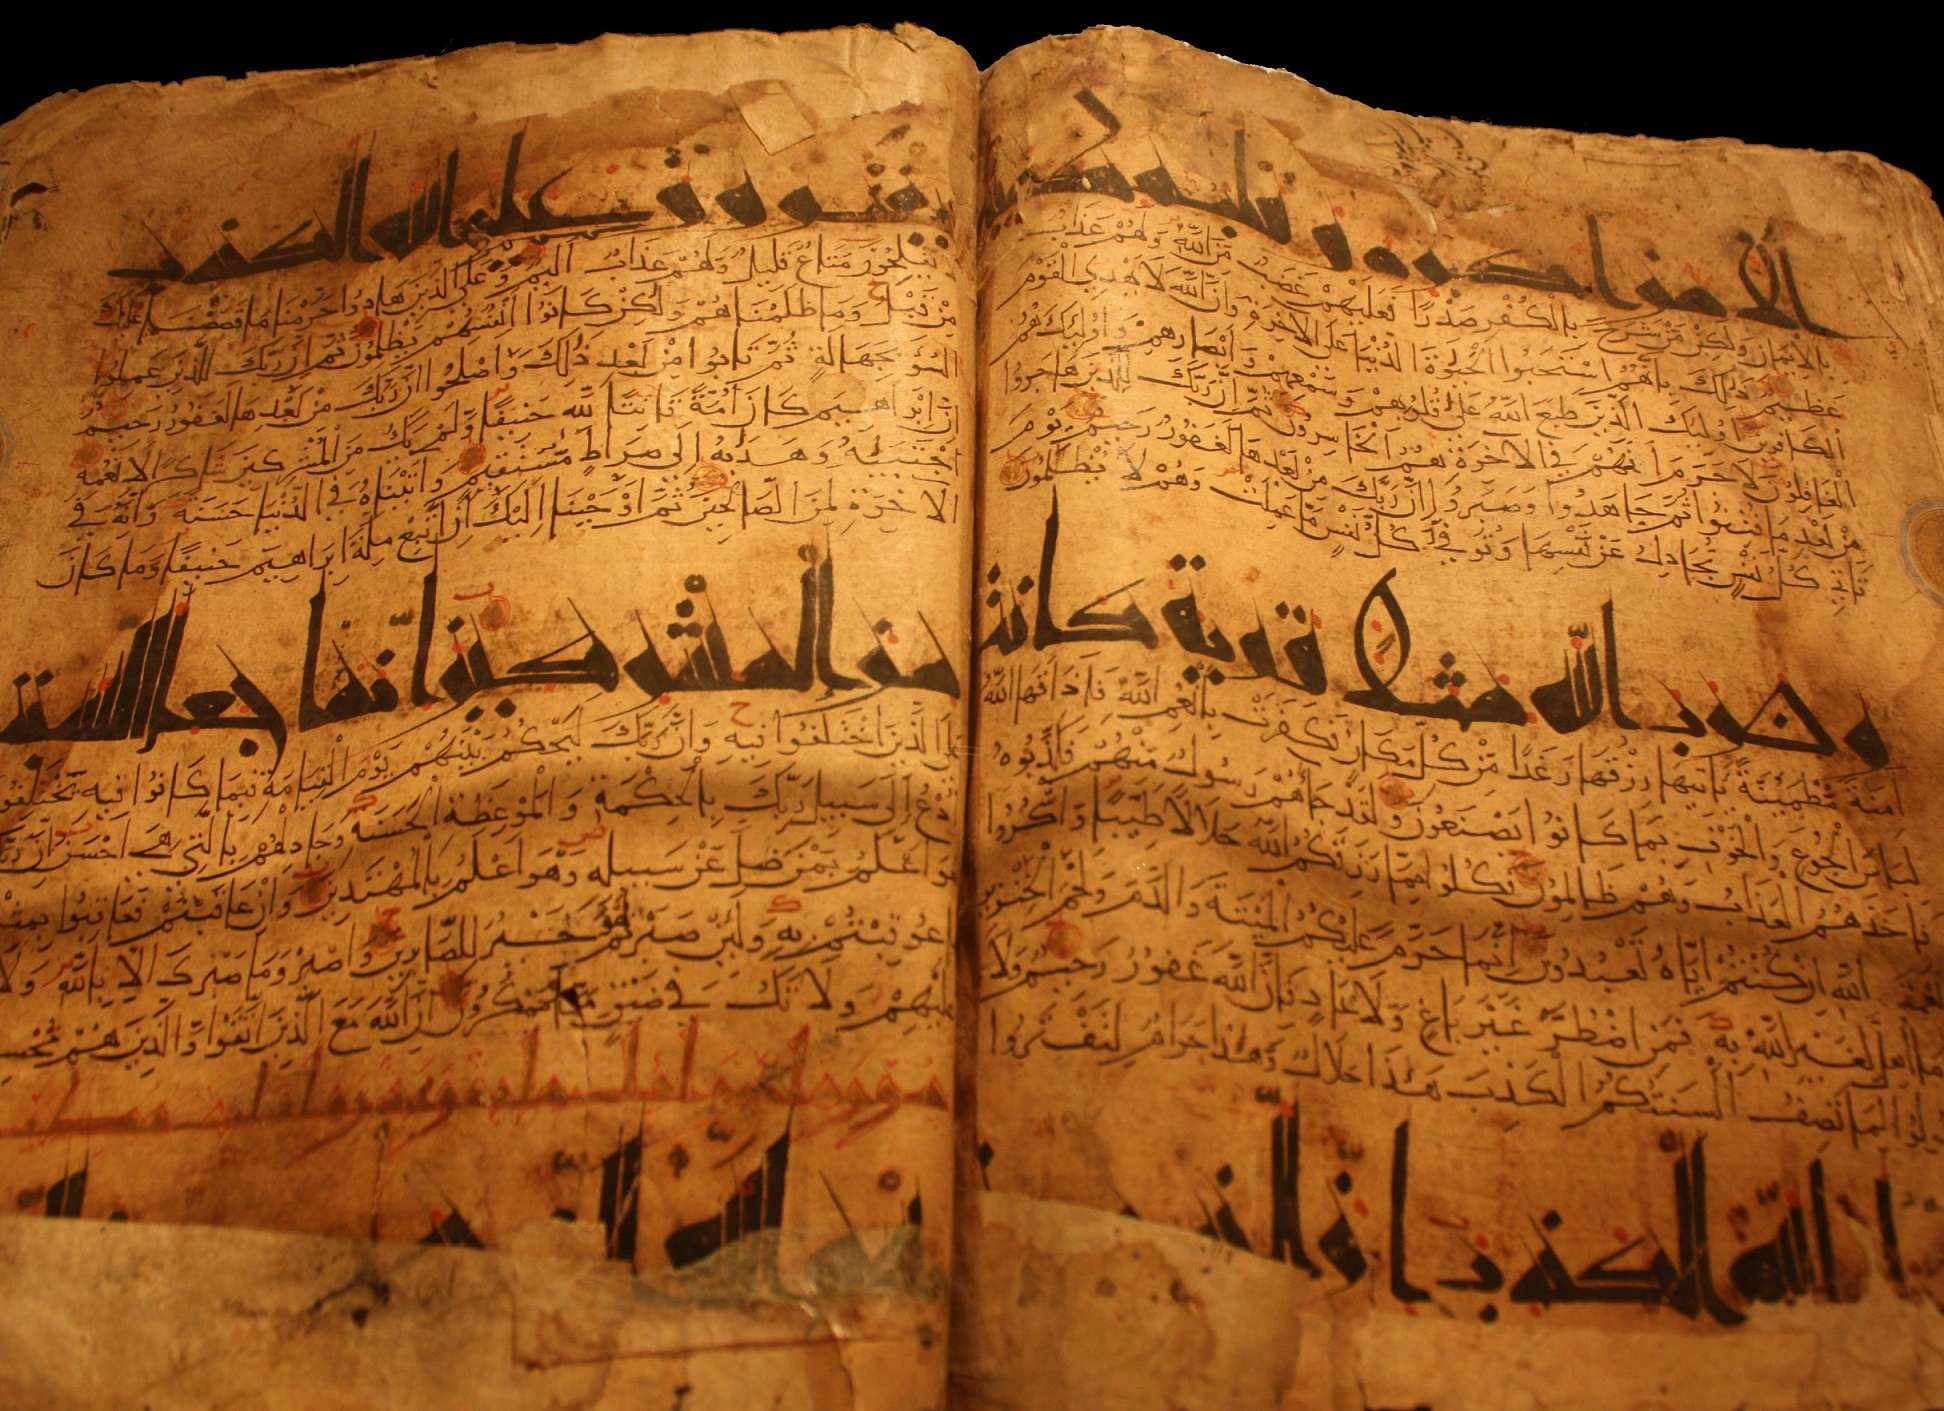 jesus4.Quran_rzabasi3